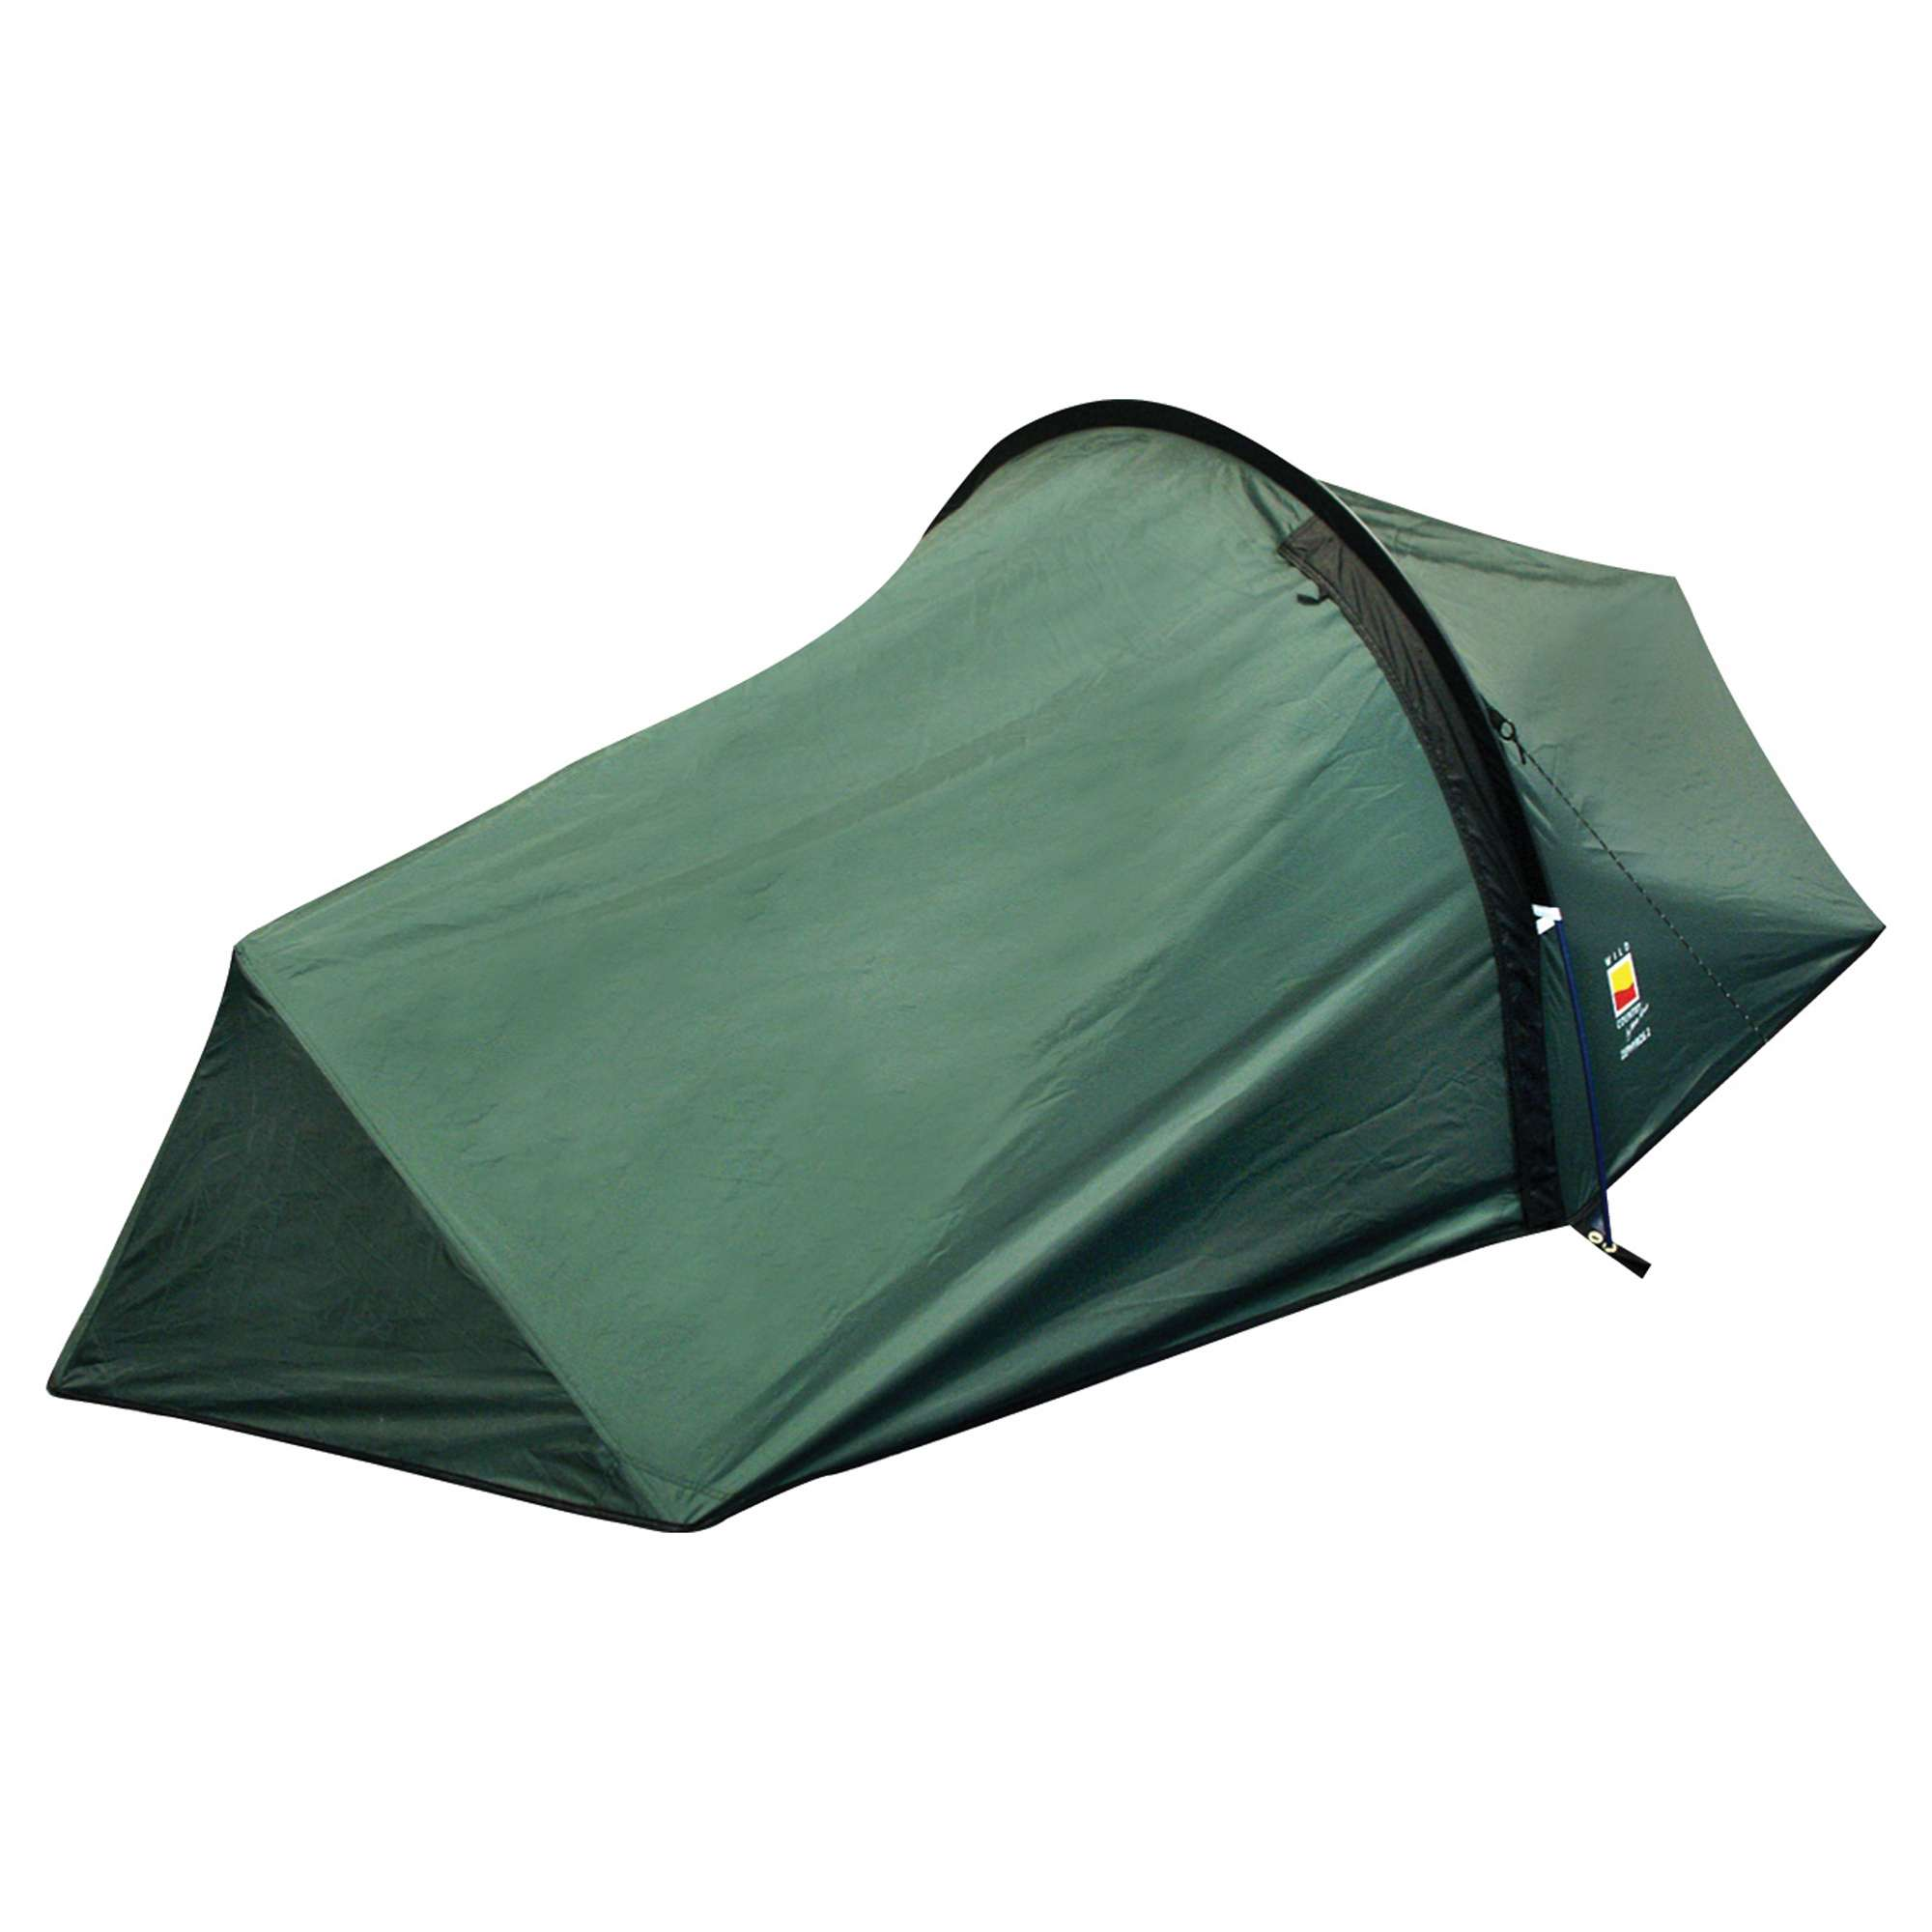 WILD COUNTRY Terra Nova Zephyros 2 Man Tent